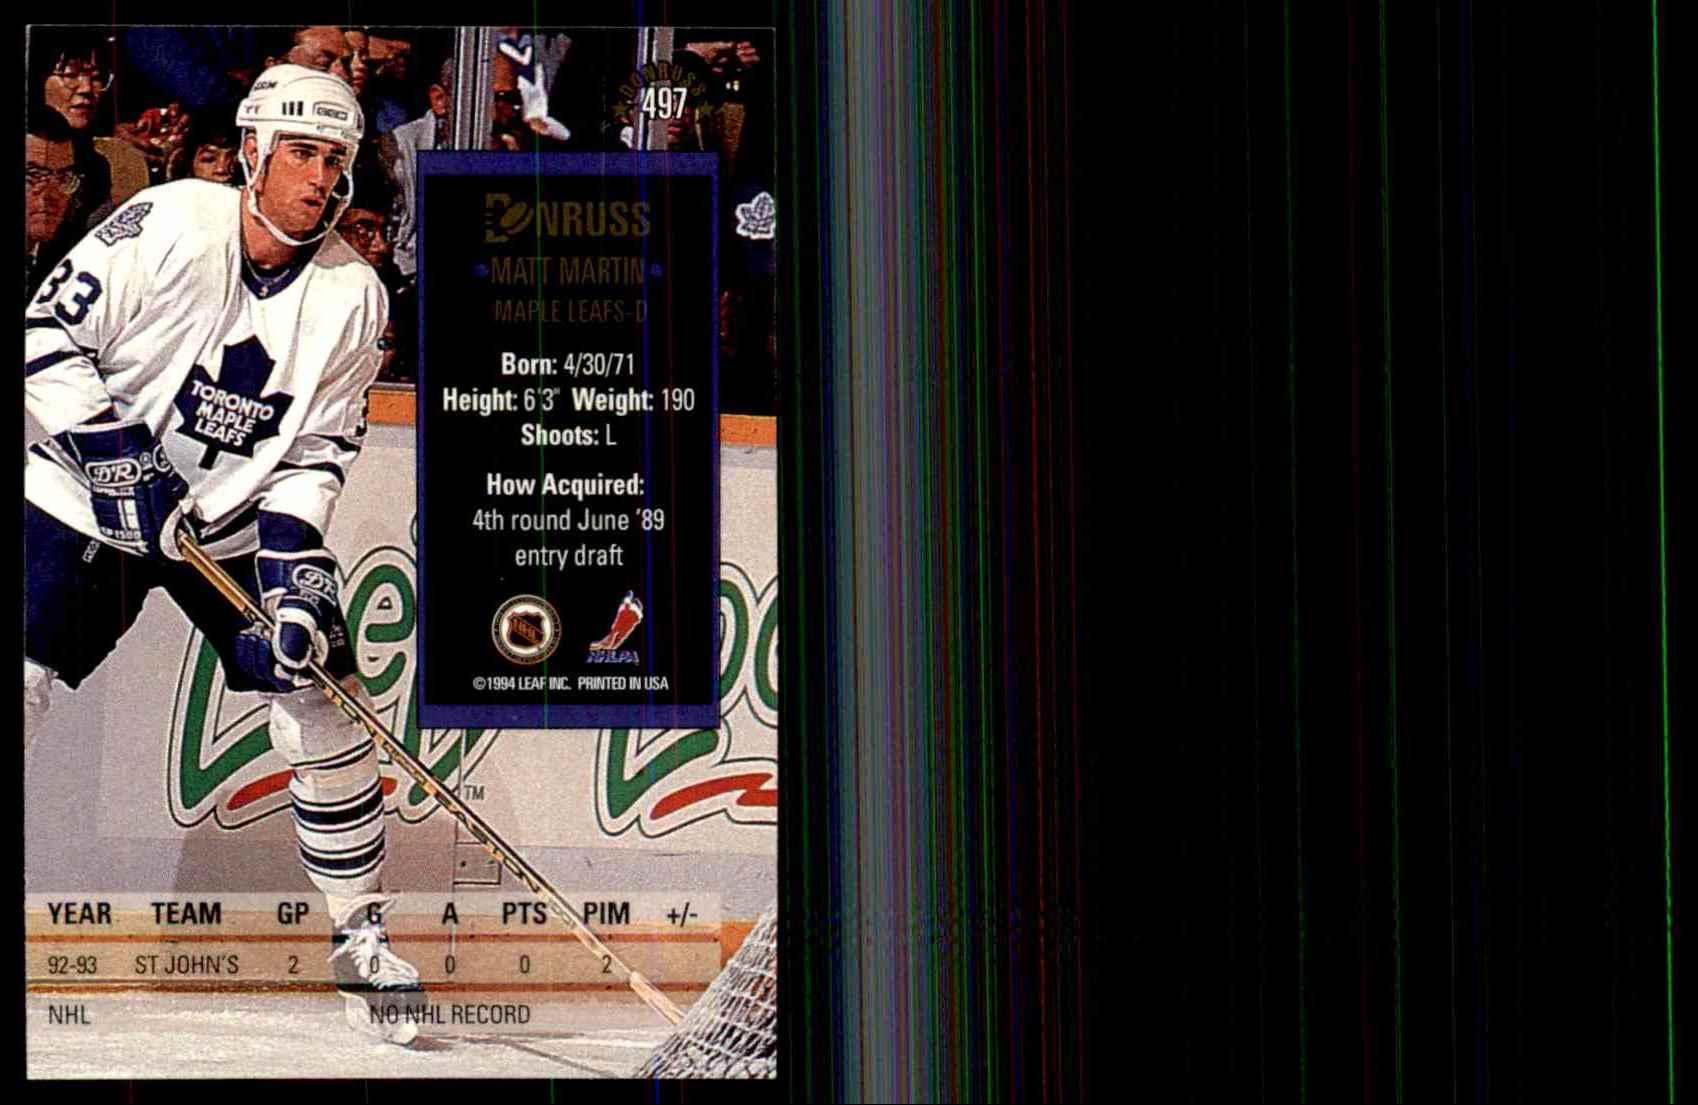 1993-94 Donruss Matt Martin RC #497 card back image